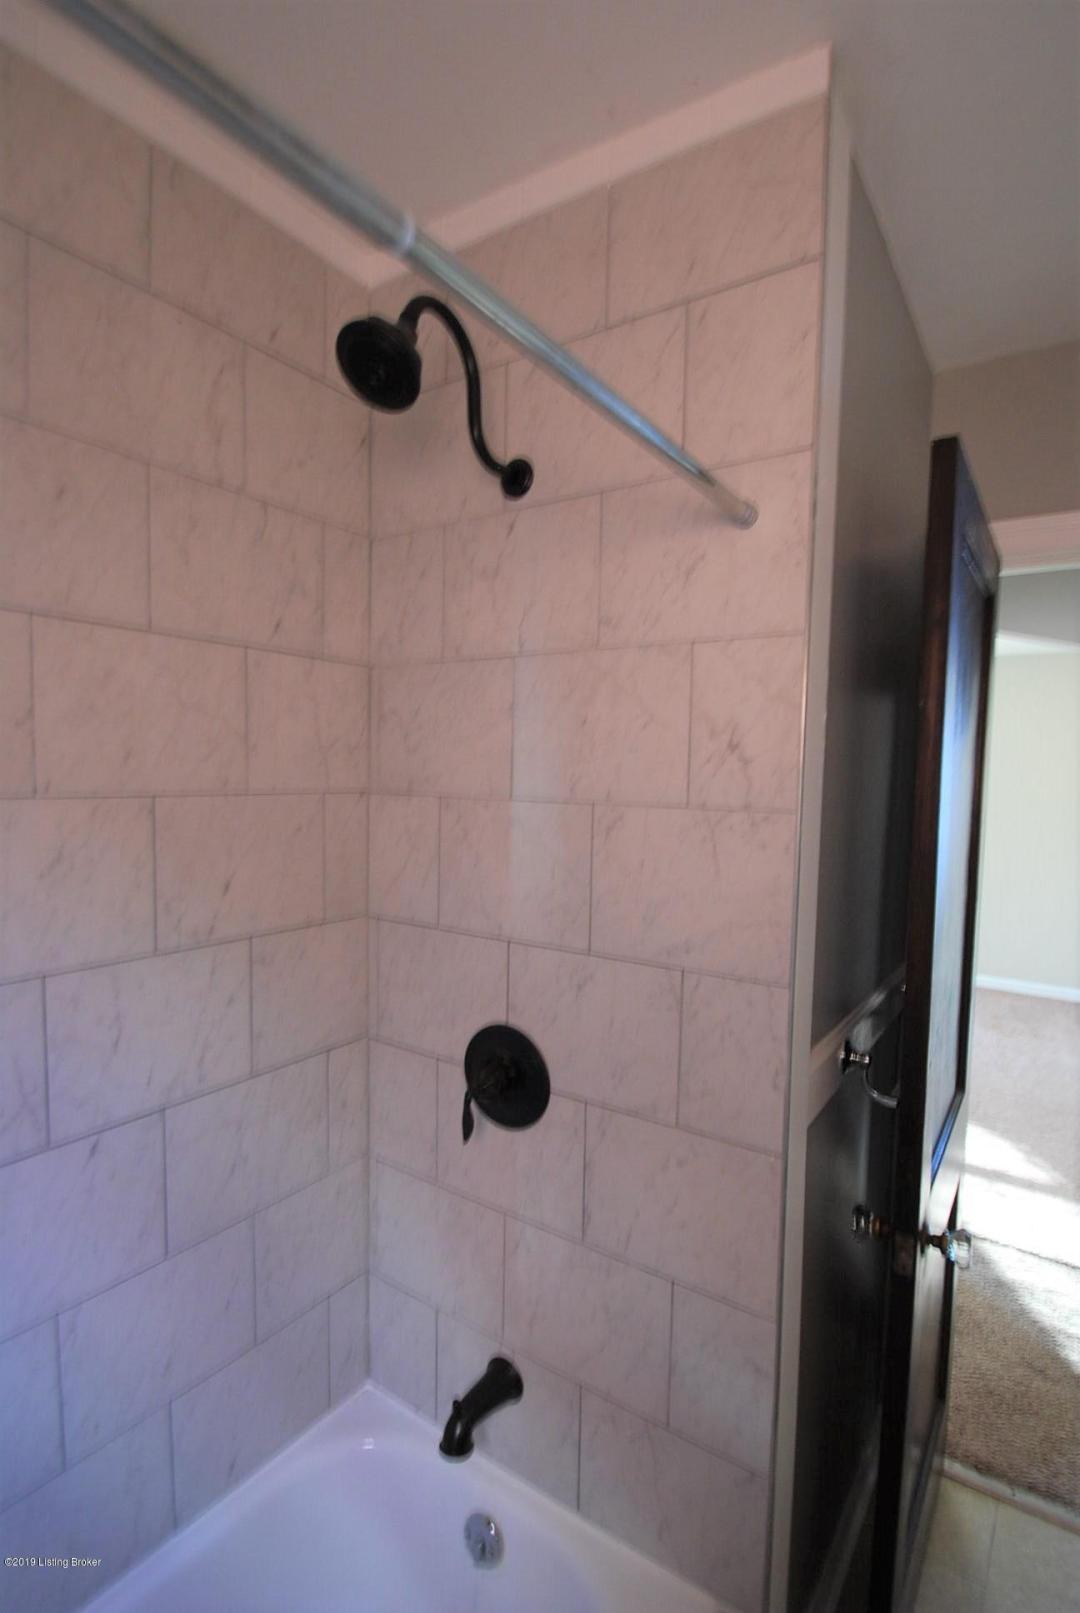 5130 Laughlin Ave, Louisville, Kentucky 40214, 2 Bedrooms Bedrooms, 5 Rooms Rooms,1 BathroomBathrooms,Rental,For Rent,Laughlin,1521921